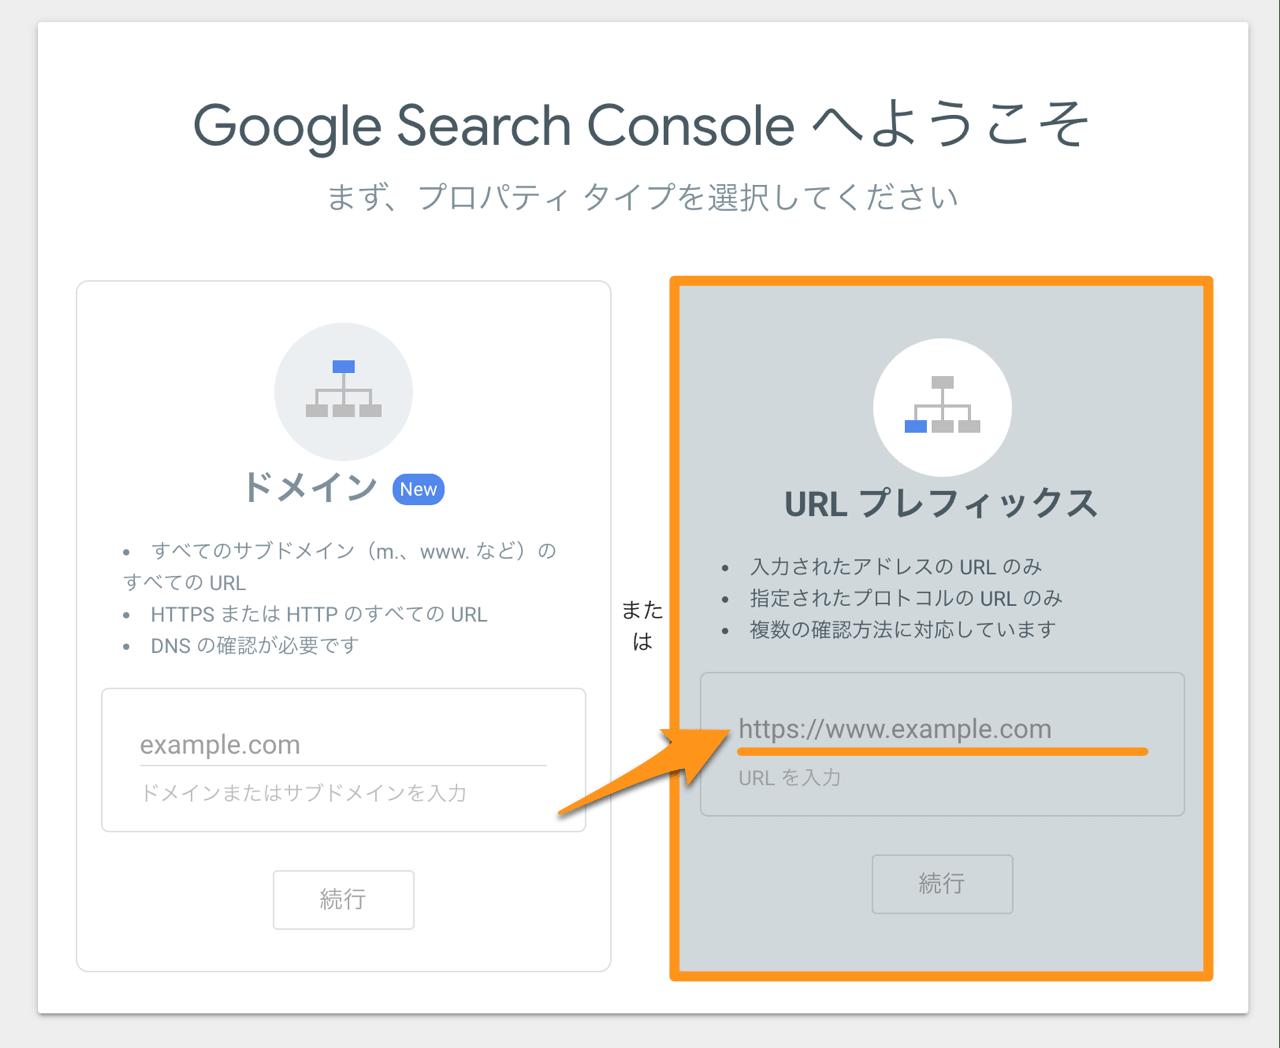 URLプレフィックスを選びURLを入力